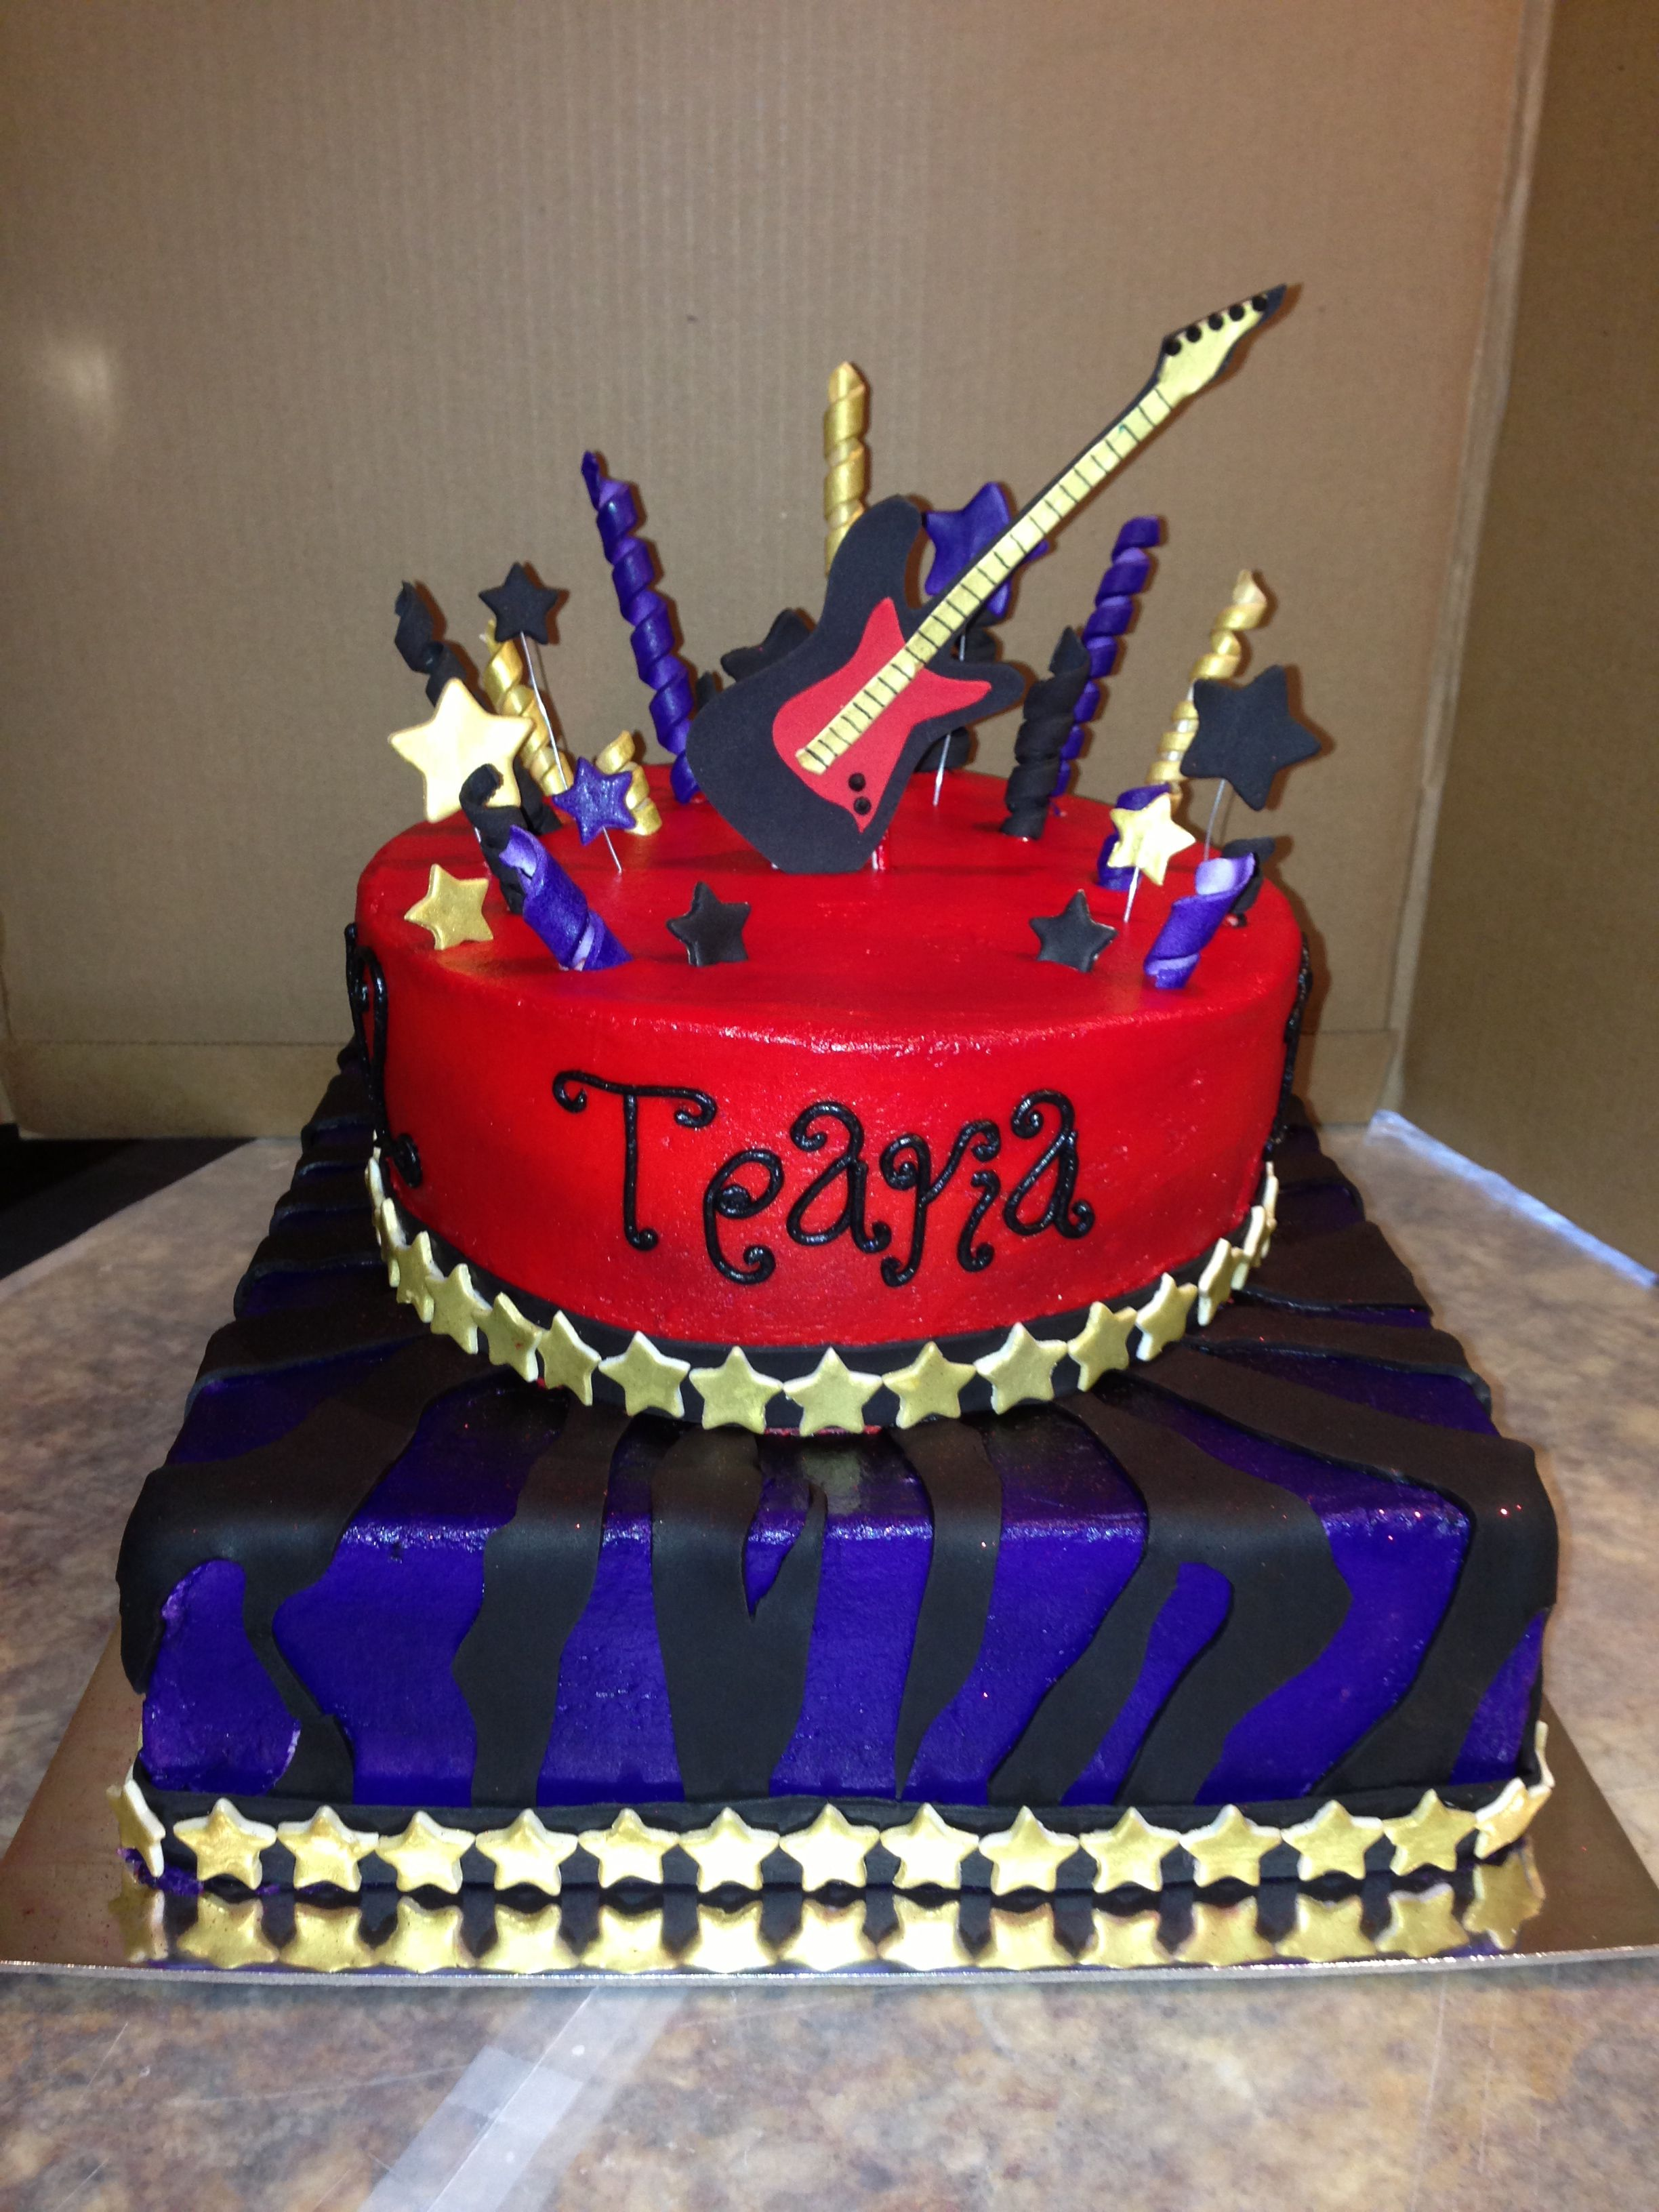 Wondrous Rockstar Cake I Made Mallory Gray 50 Cakes Of Gray Facebook Funny Birthday Cards Online Alyptdamsfinfo